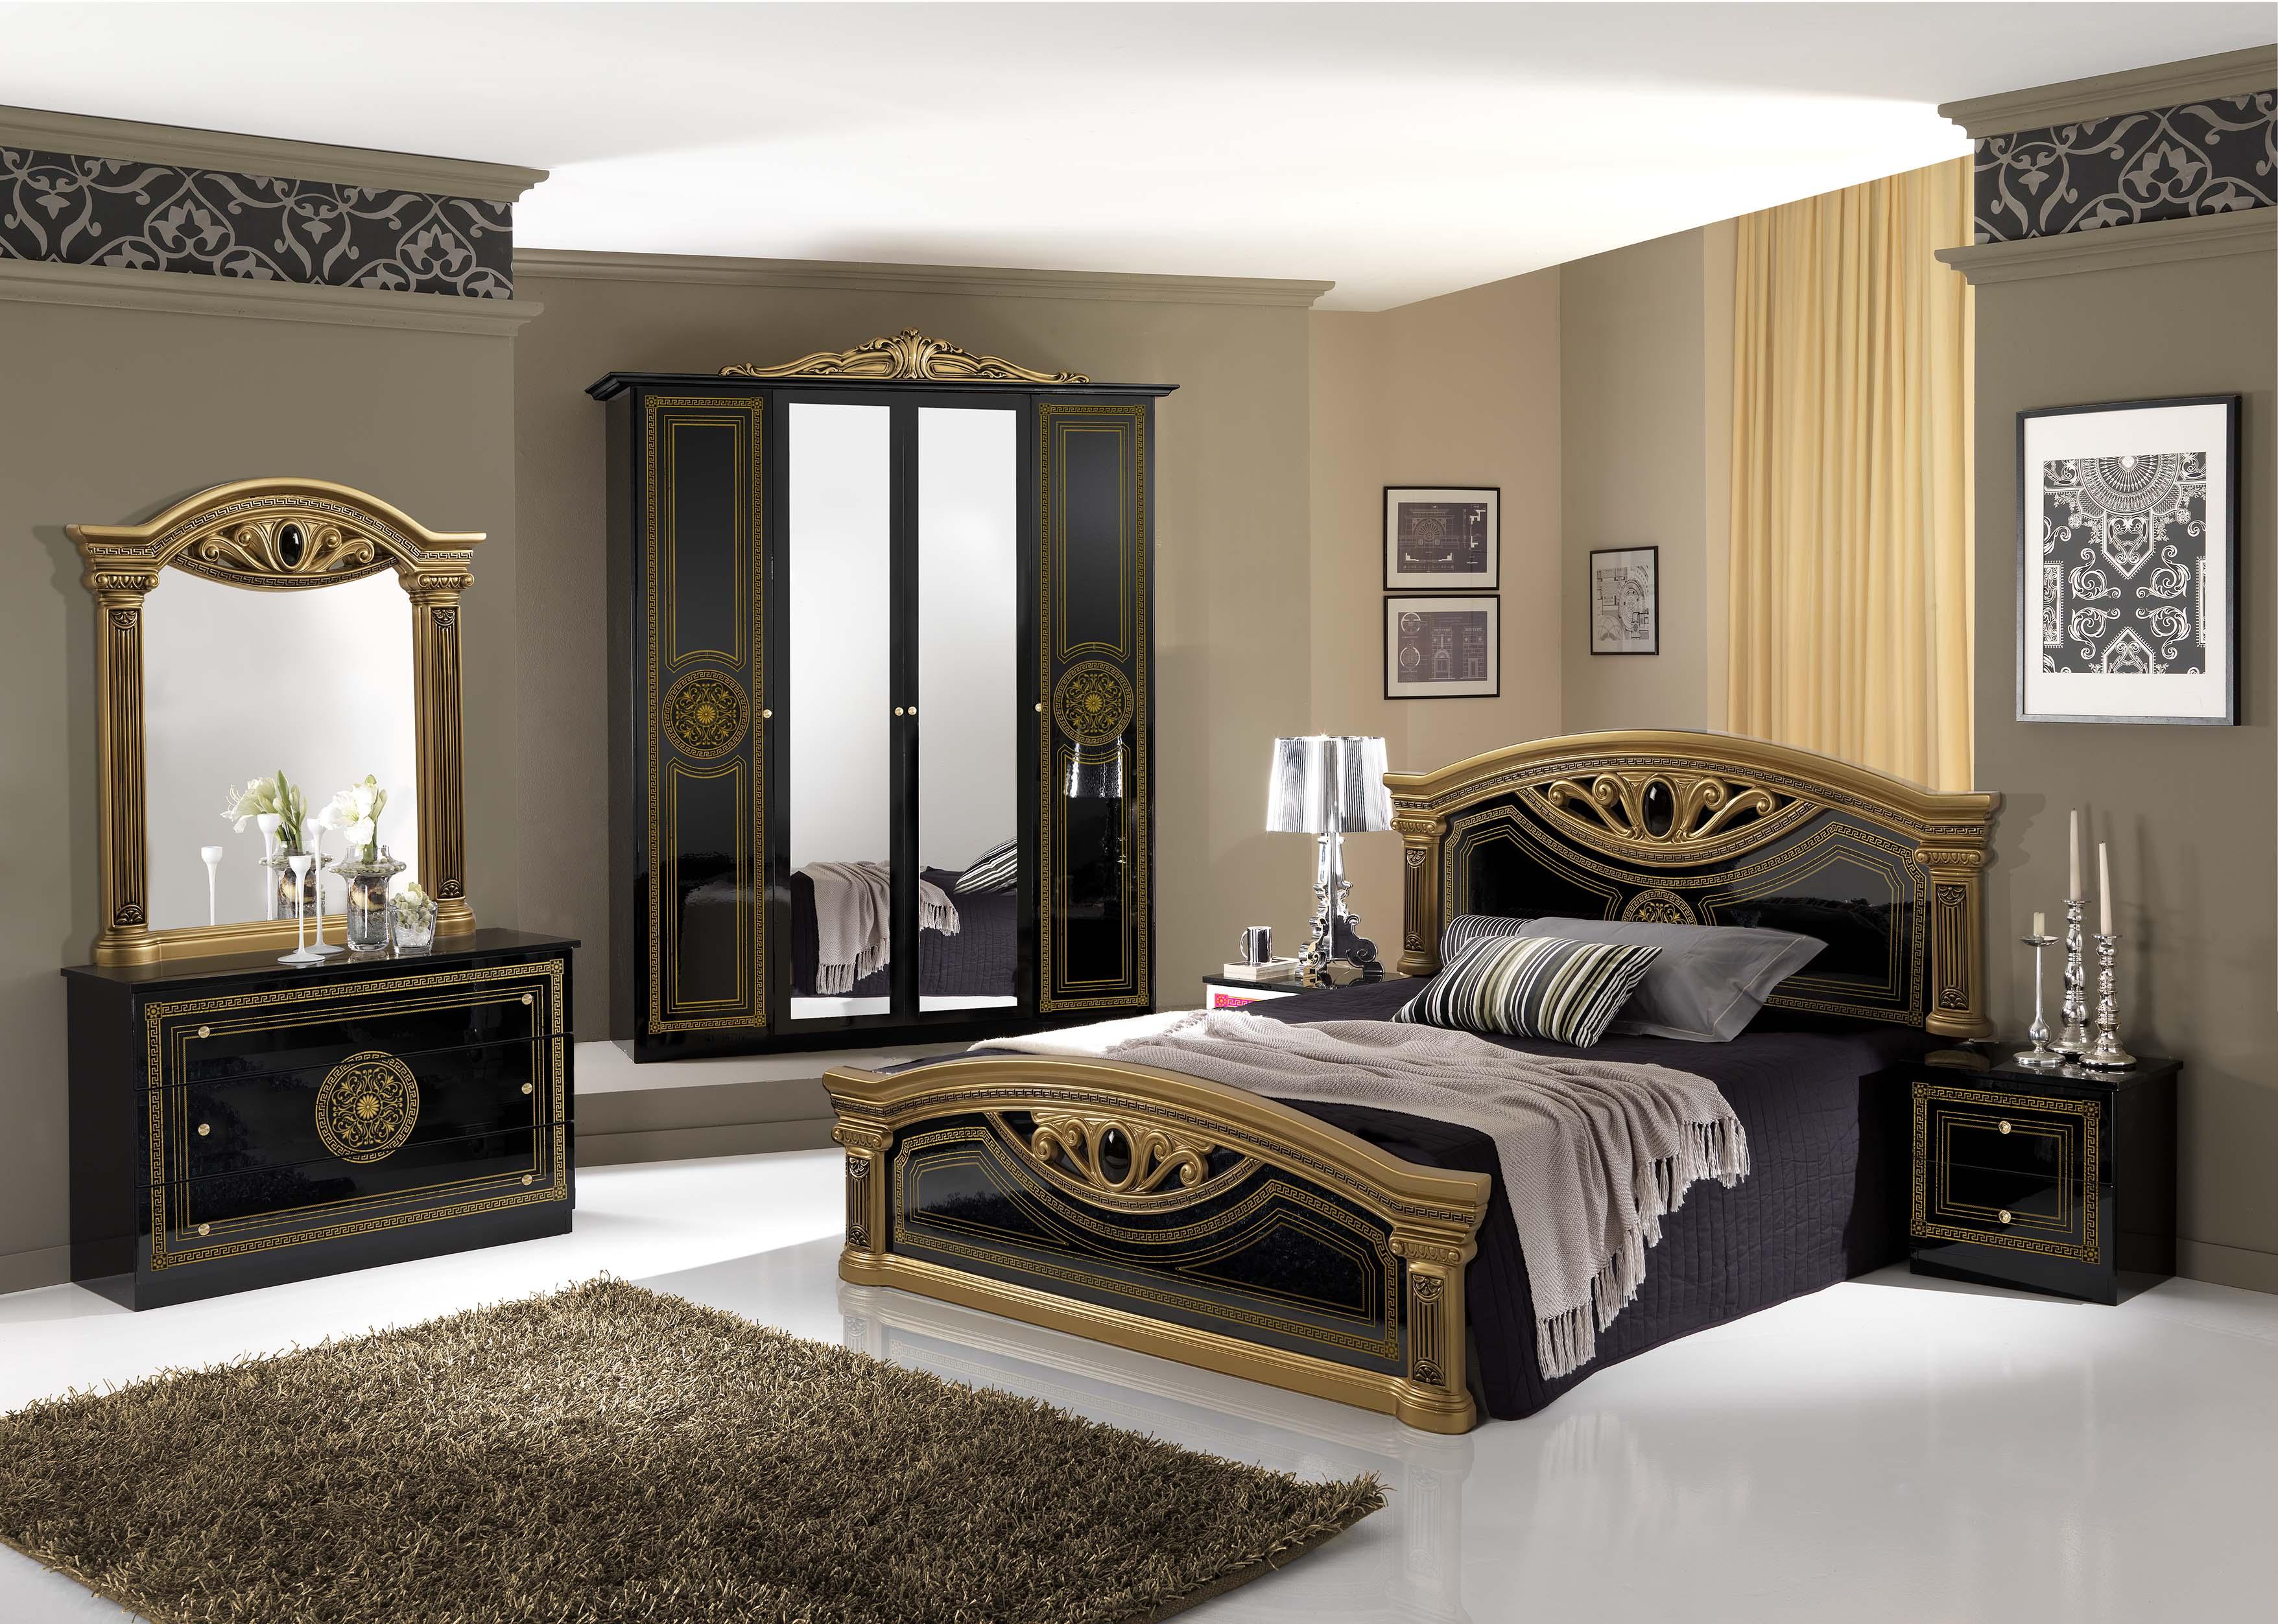 bett 180x200 cm giulia in weiss silber barock klassik xp pfglclt18weiss. Black Bedroom Furniture Sets. Home Design Ideas